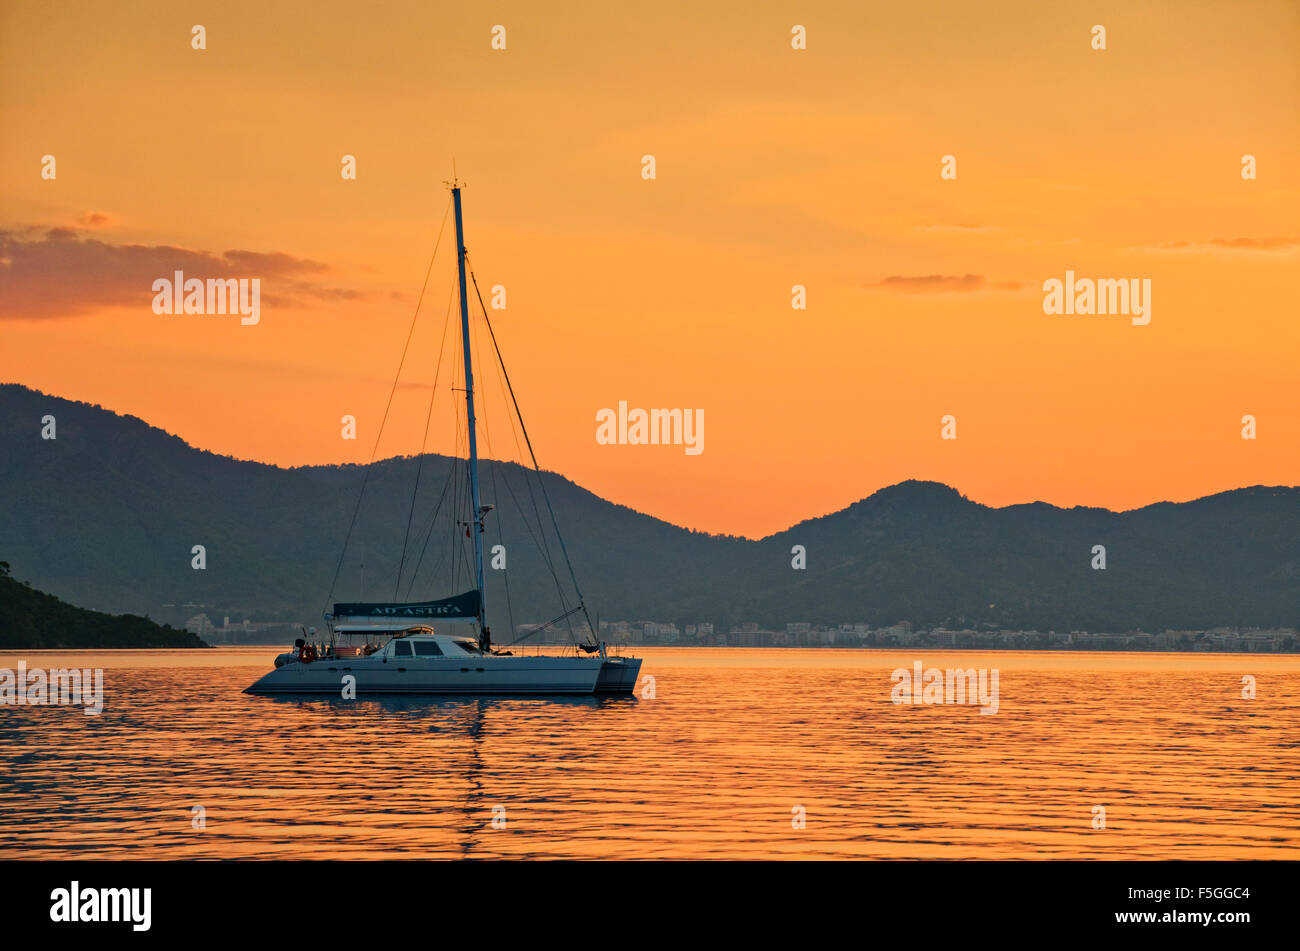 Catamaran anchored off-shore at sunset - Stock Image